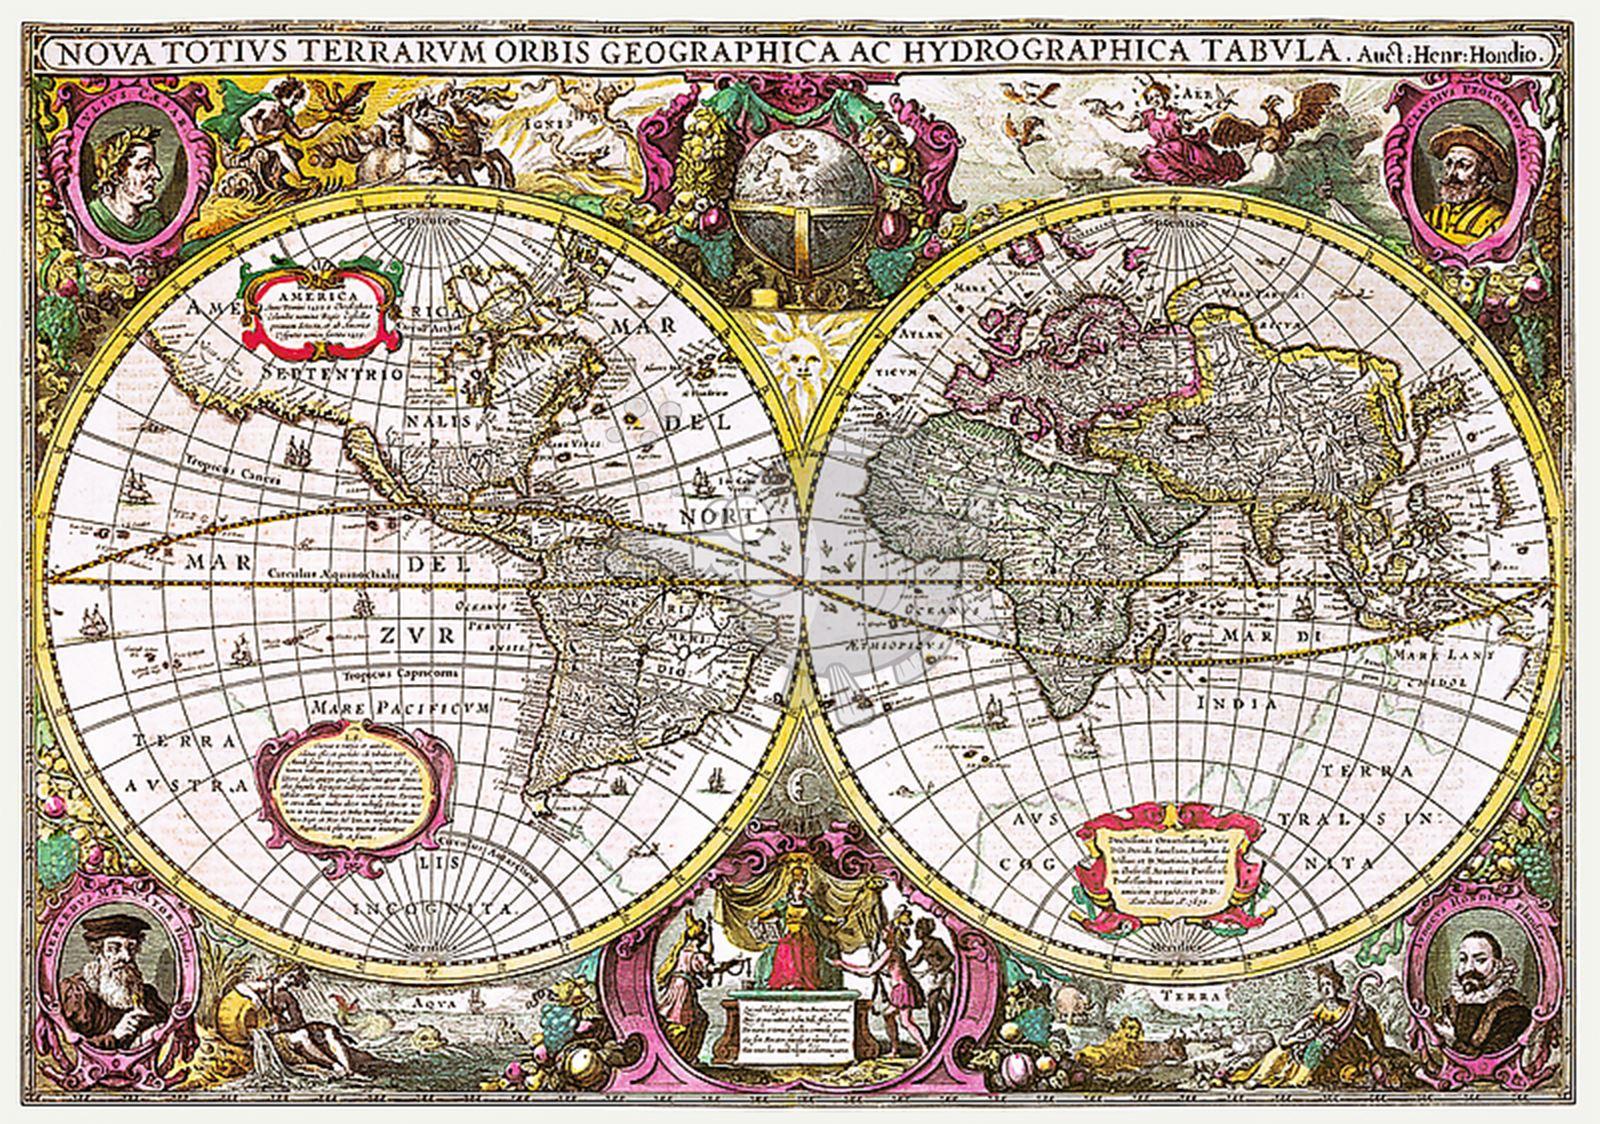 Trefl-300-500-1000-1500-2000-3000-4000-6000-Piece-Jigsaw-Puzzle-Landscapes-City thumbnail 7